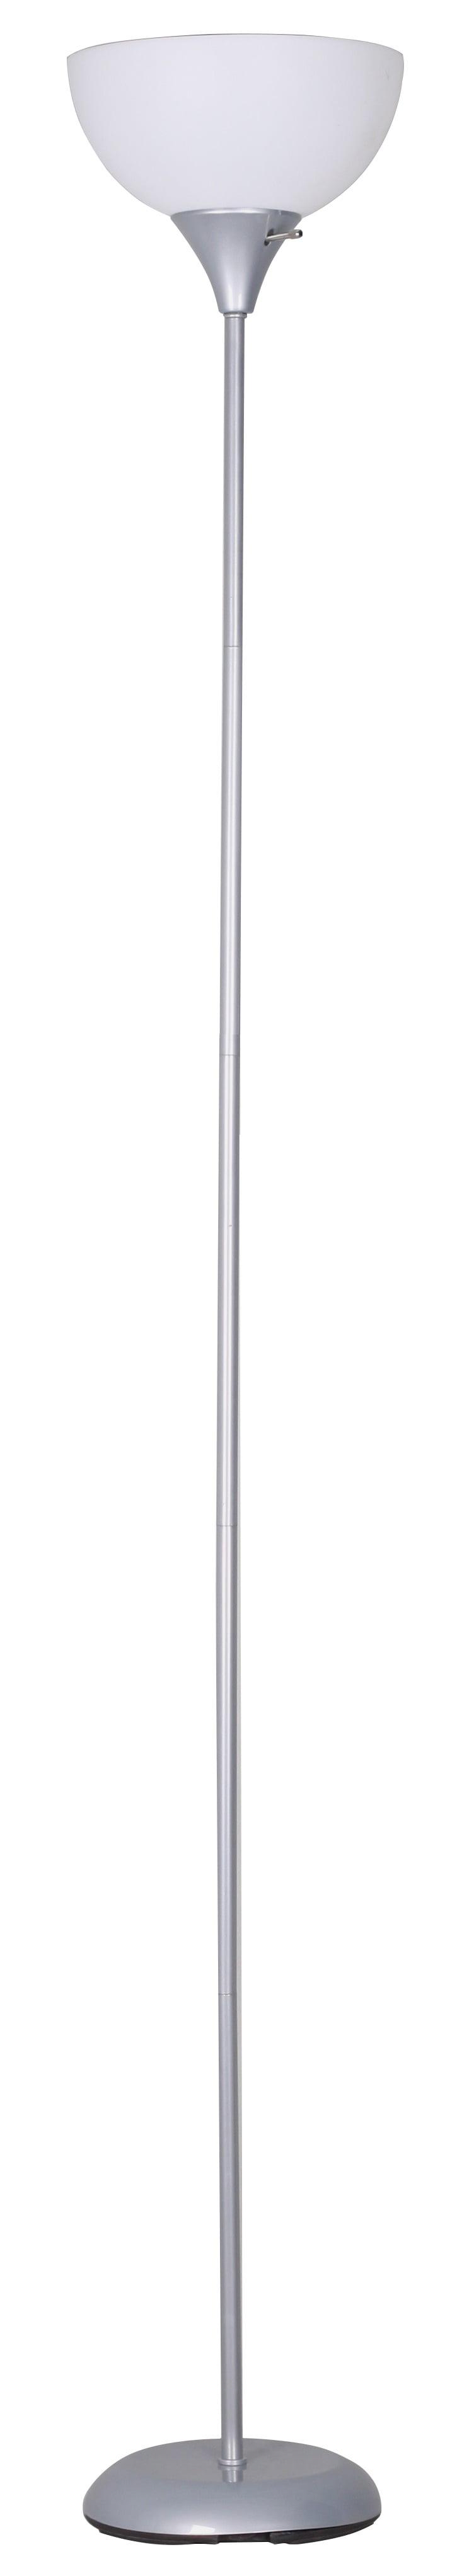 Mainstays Torchiere Floor Lamp Silver Walmart Com